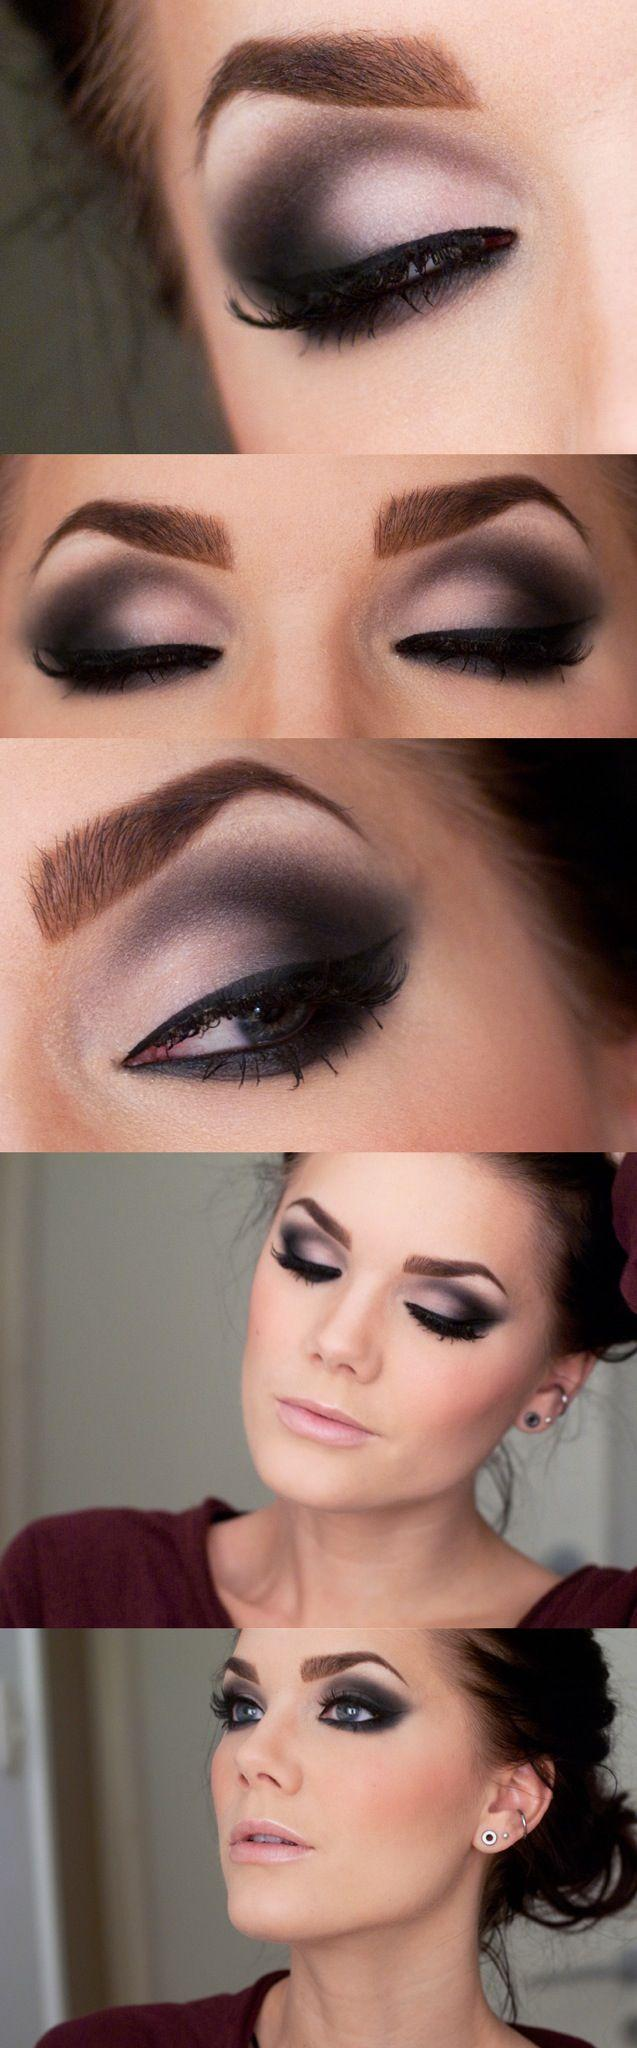 Свадьба - 2014 Blush Makeup Tutorials And Skills